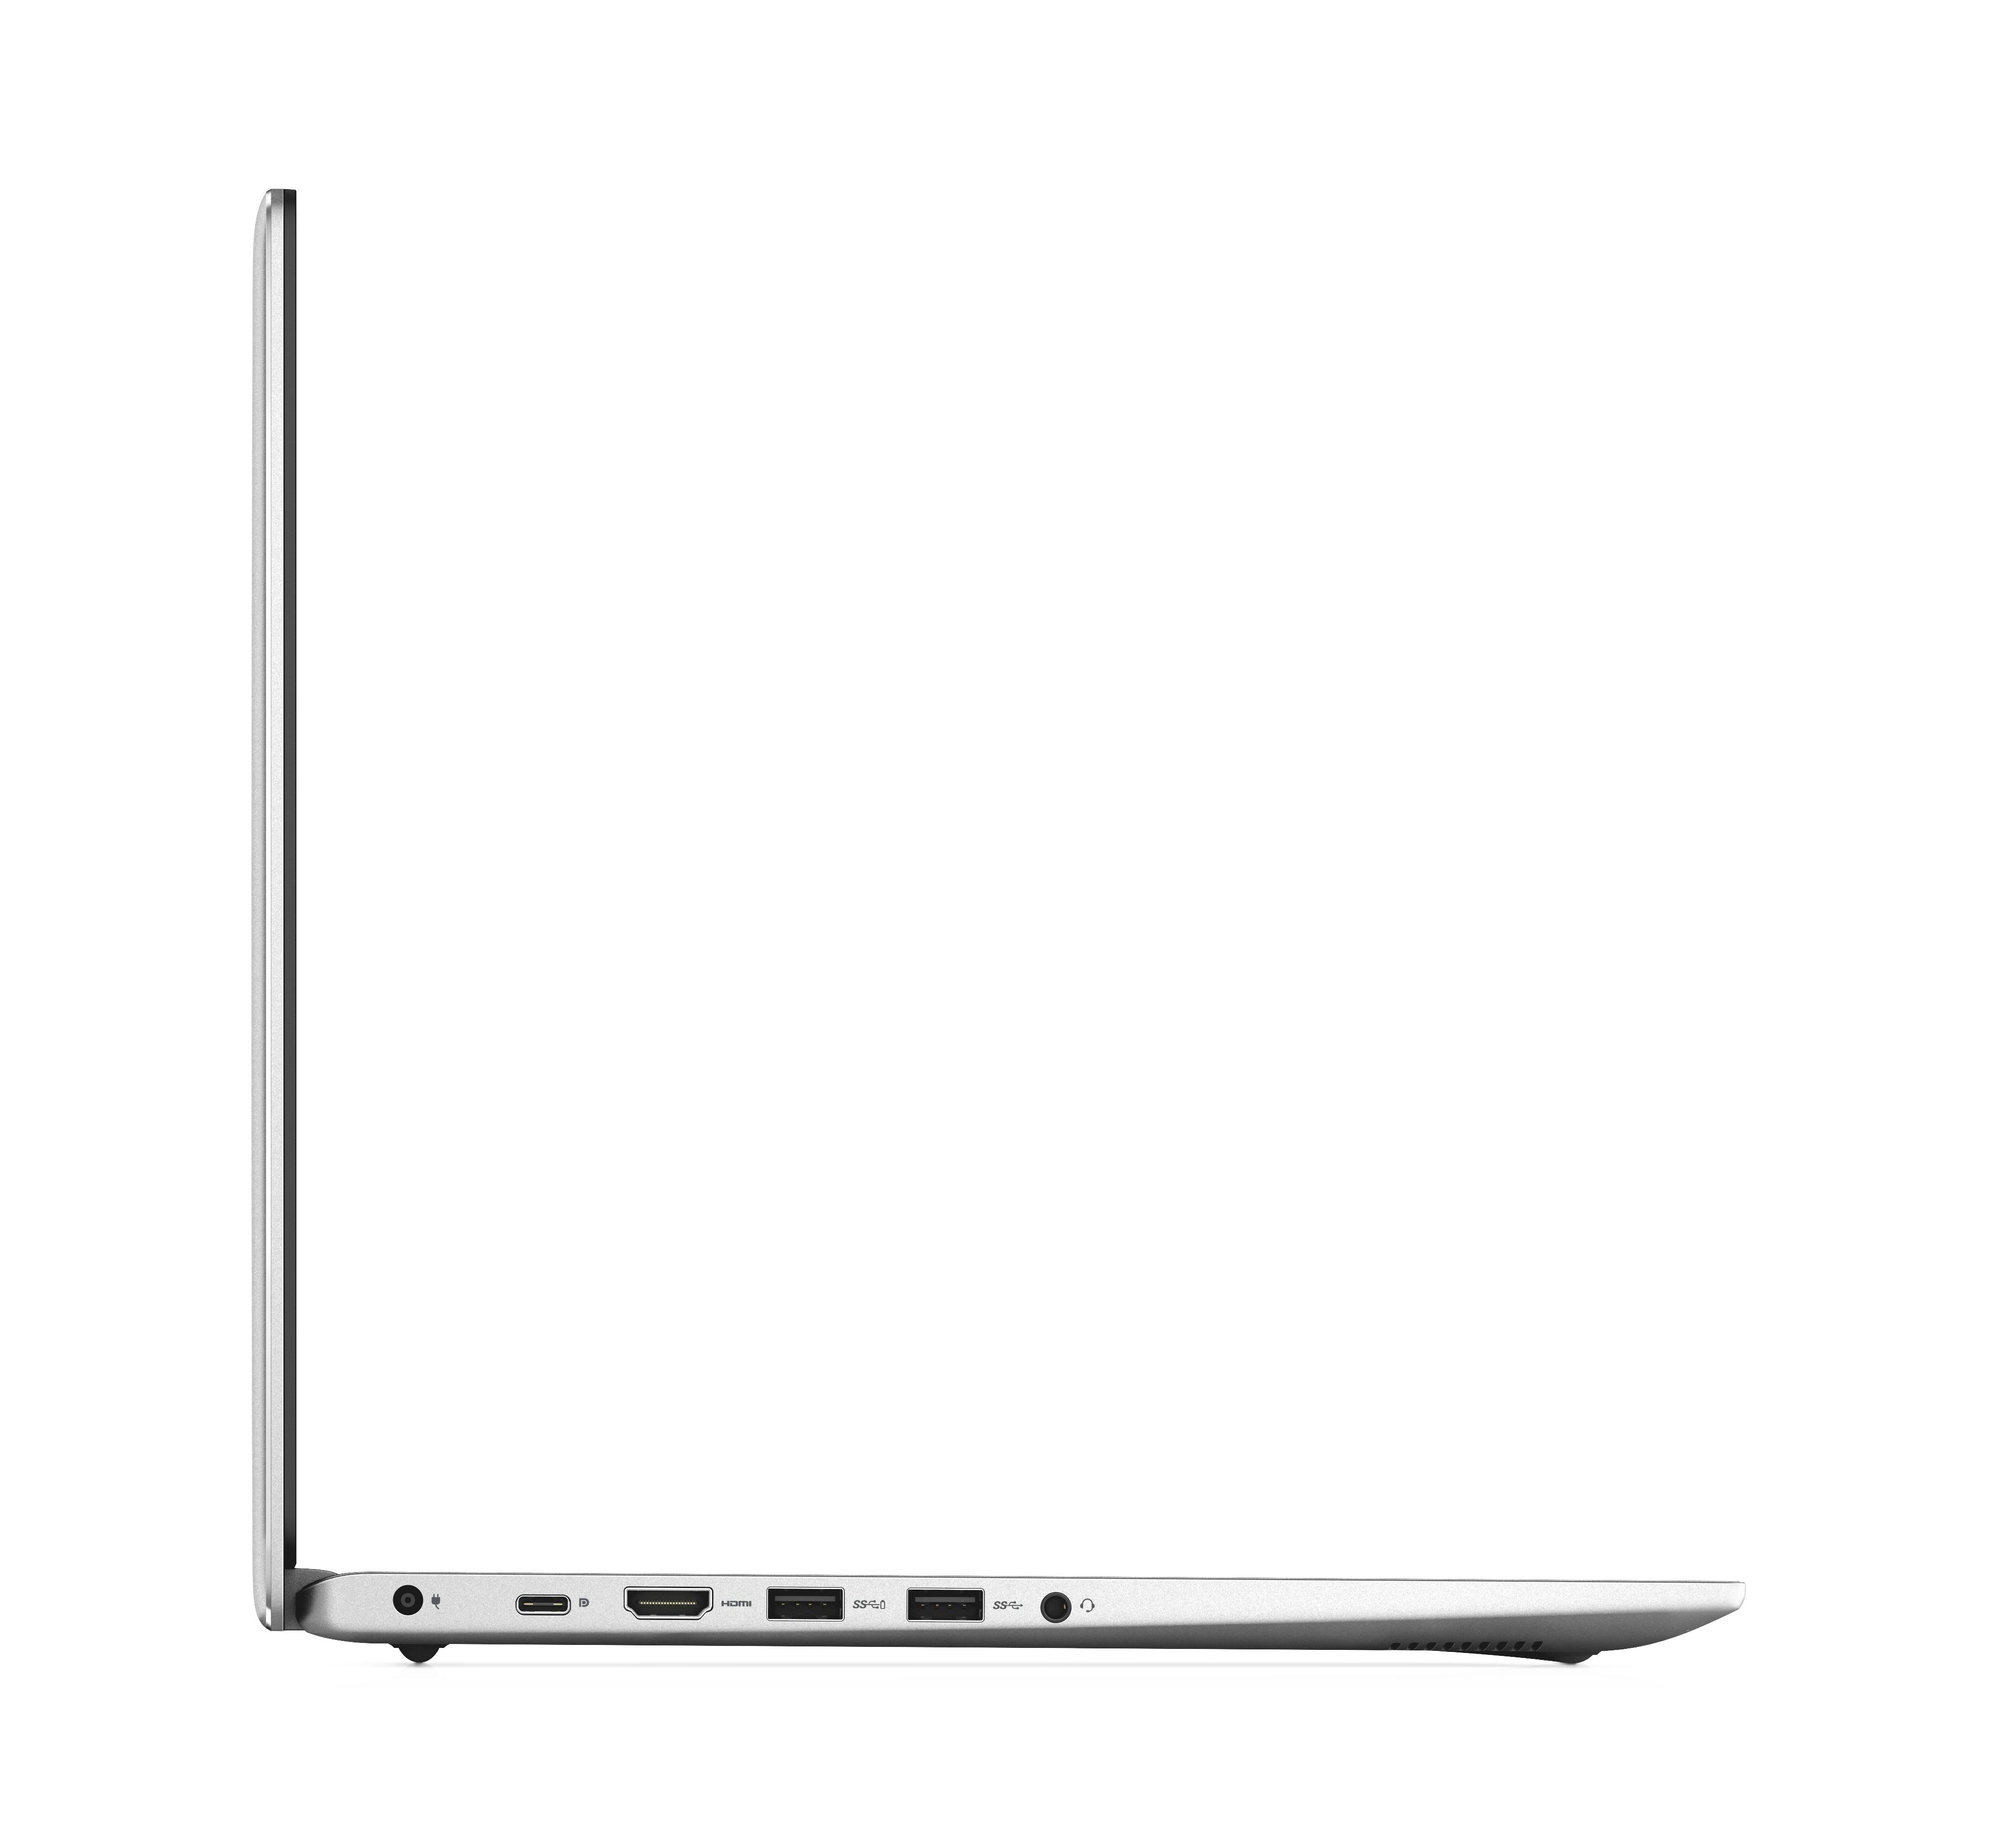 "DELL Inspiron 7570 1.6GHz i5-8250U 15.6"" 1920 x 1080Pixel Touch screen Nero, Platino, Argento Computer portatile"